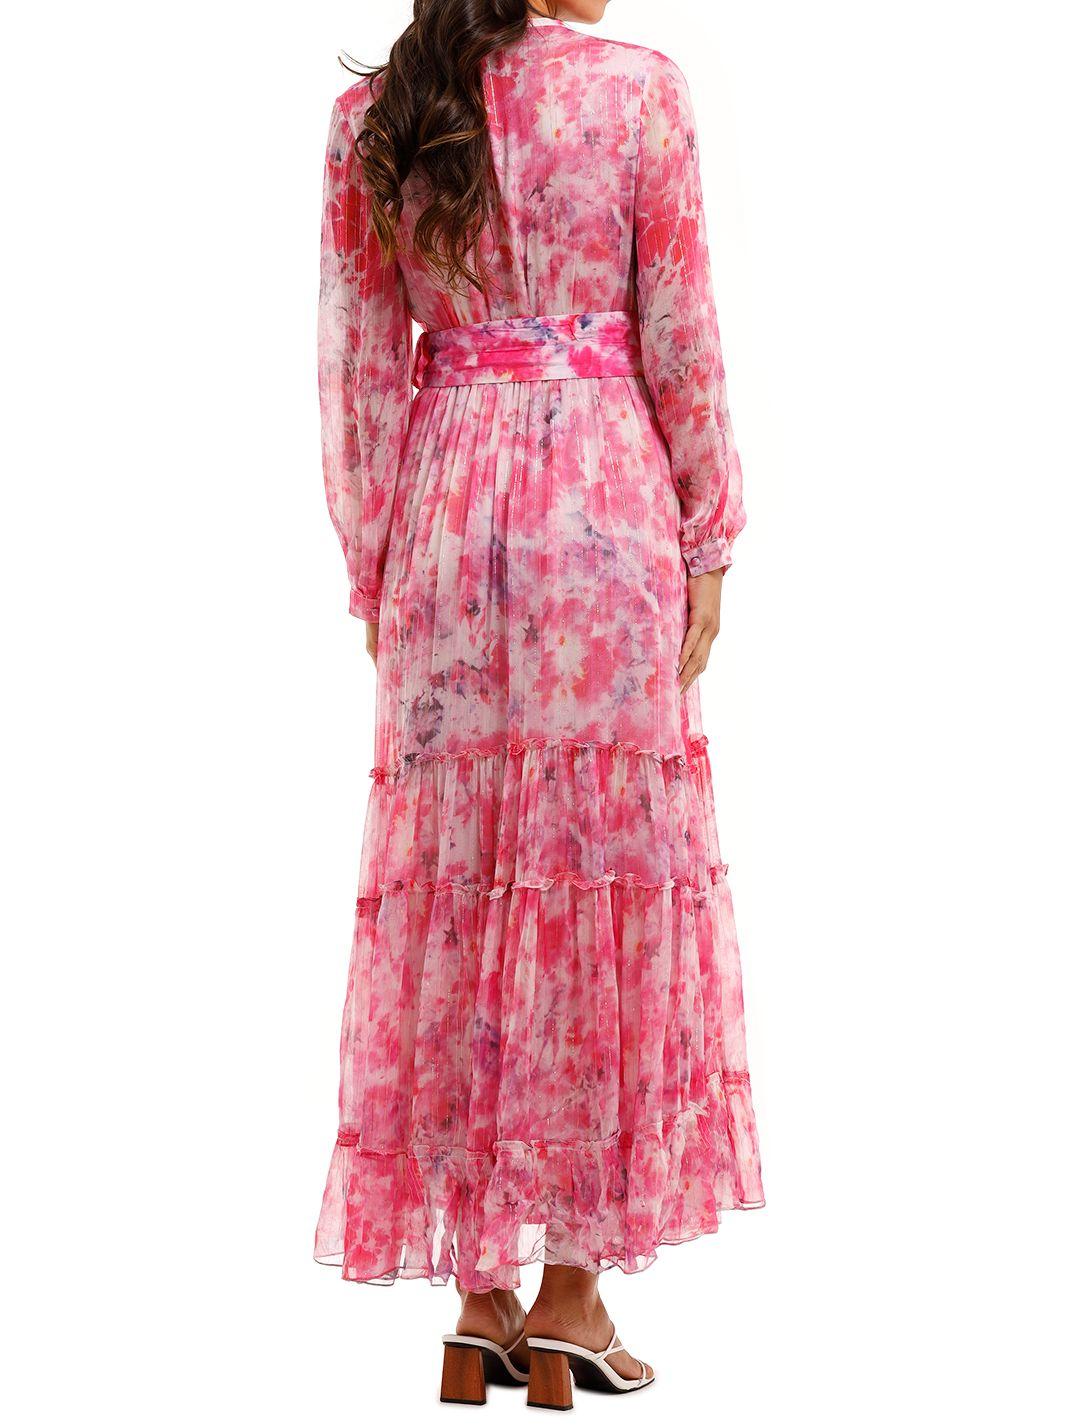 Rococo Sand Hikari Dress Tiered skirt